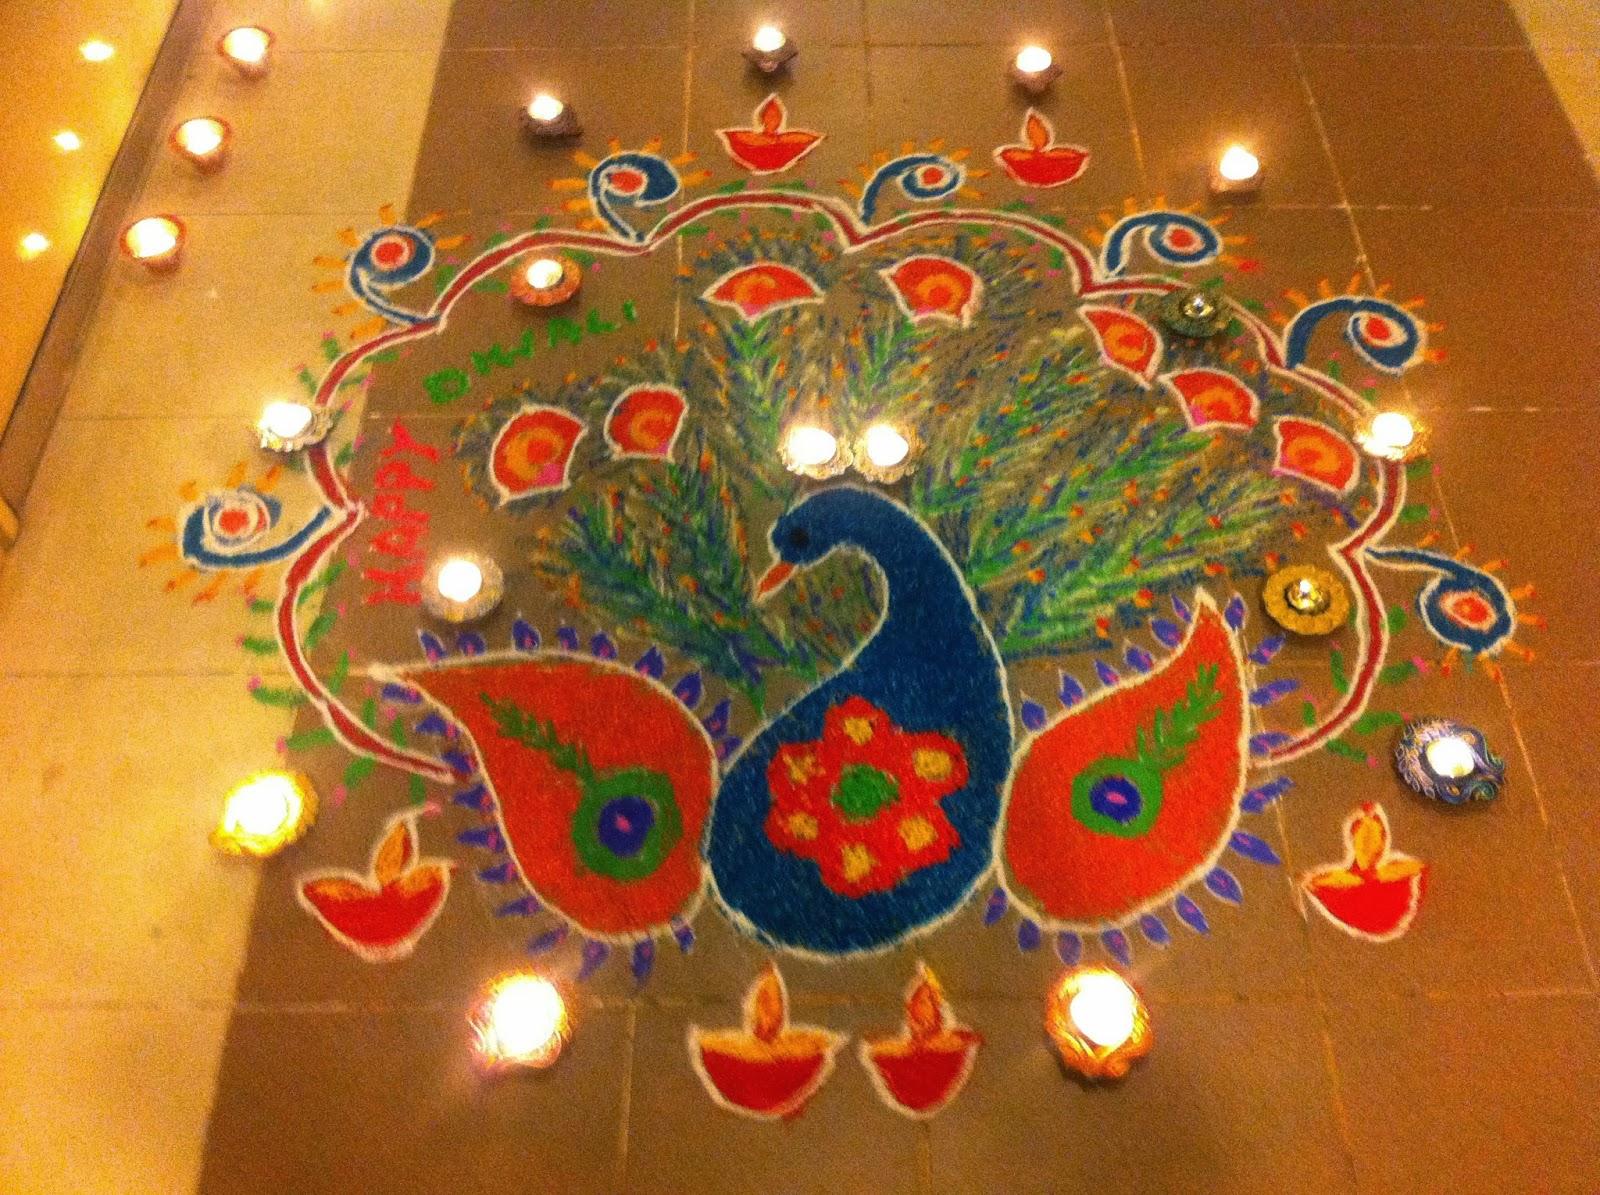 Beautiful HD Wallpapers 4 u Free Download: Diwali Rangoli HD Wallpaper ...